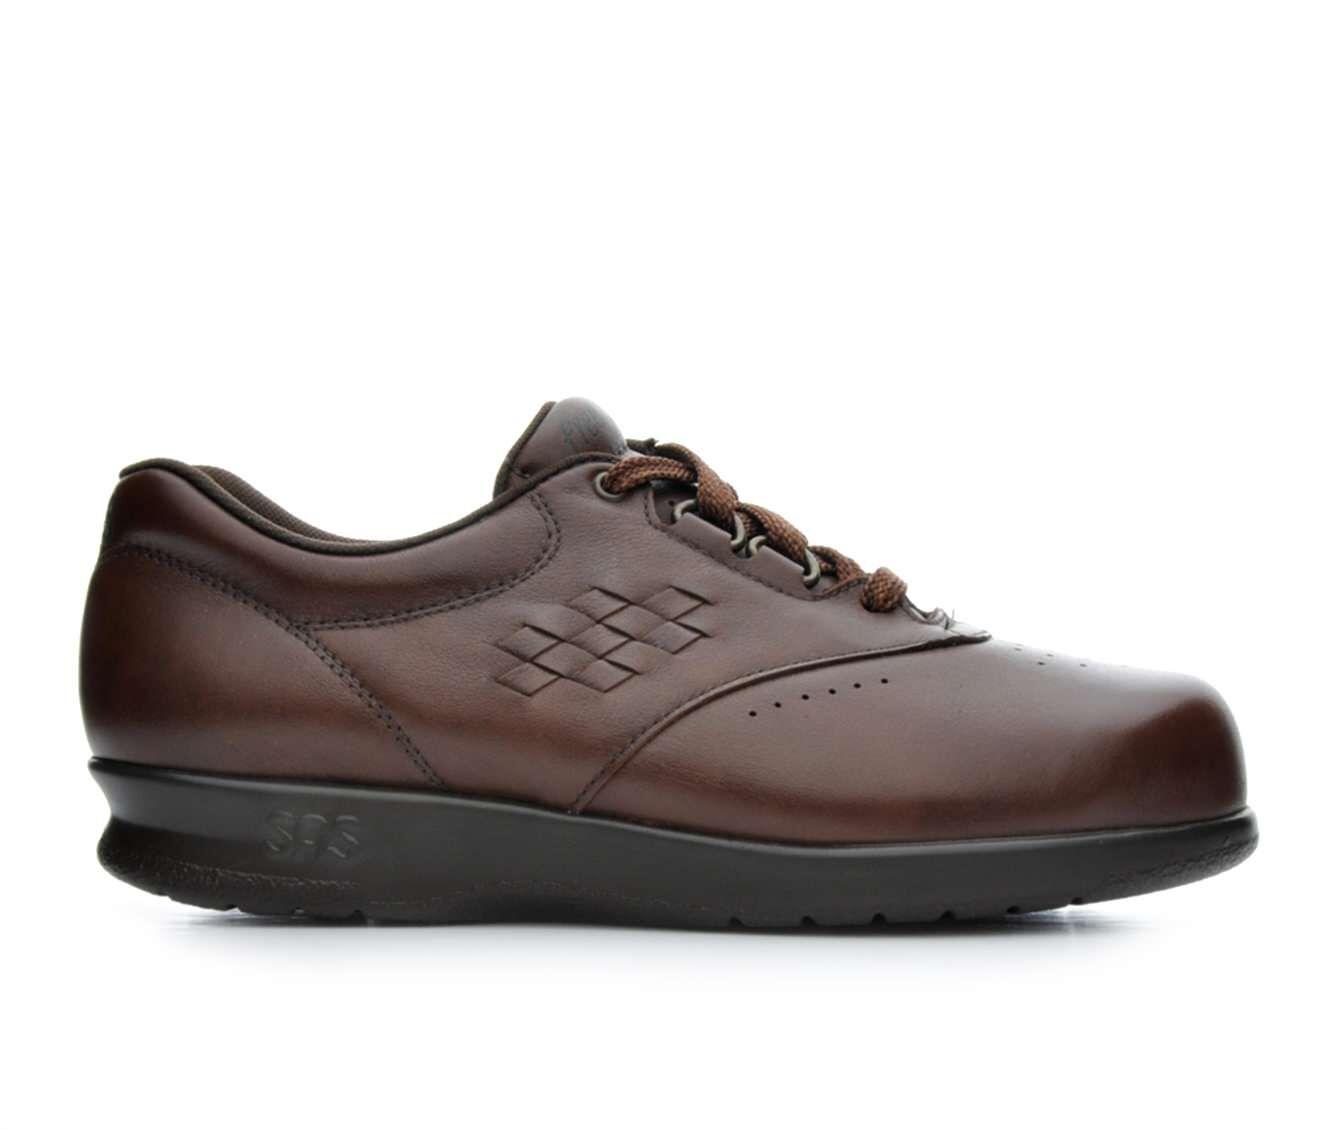 Images. Women's Sas Freetime Comfort W Walking Shoes